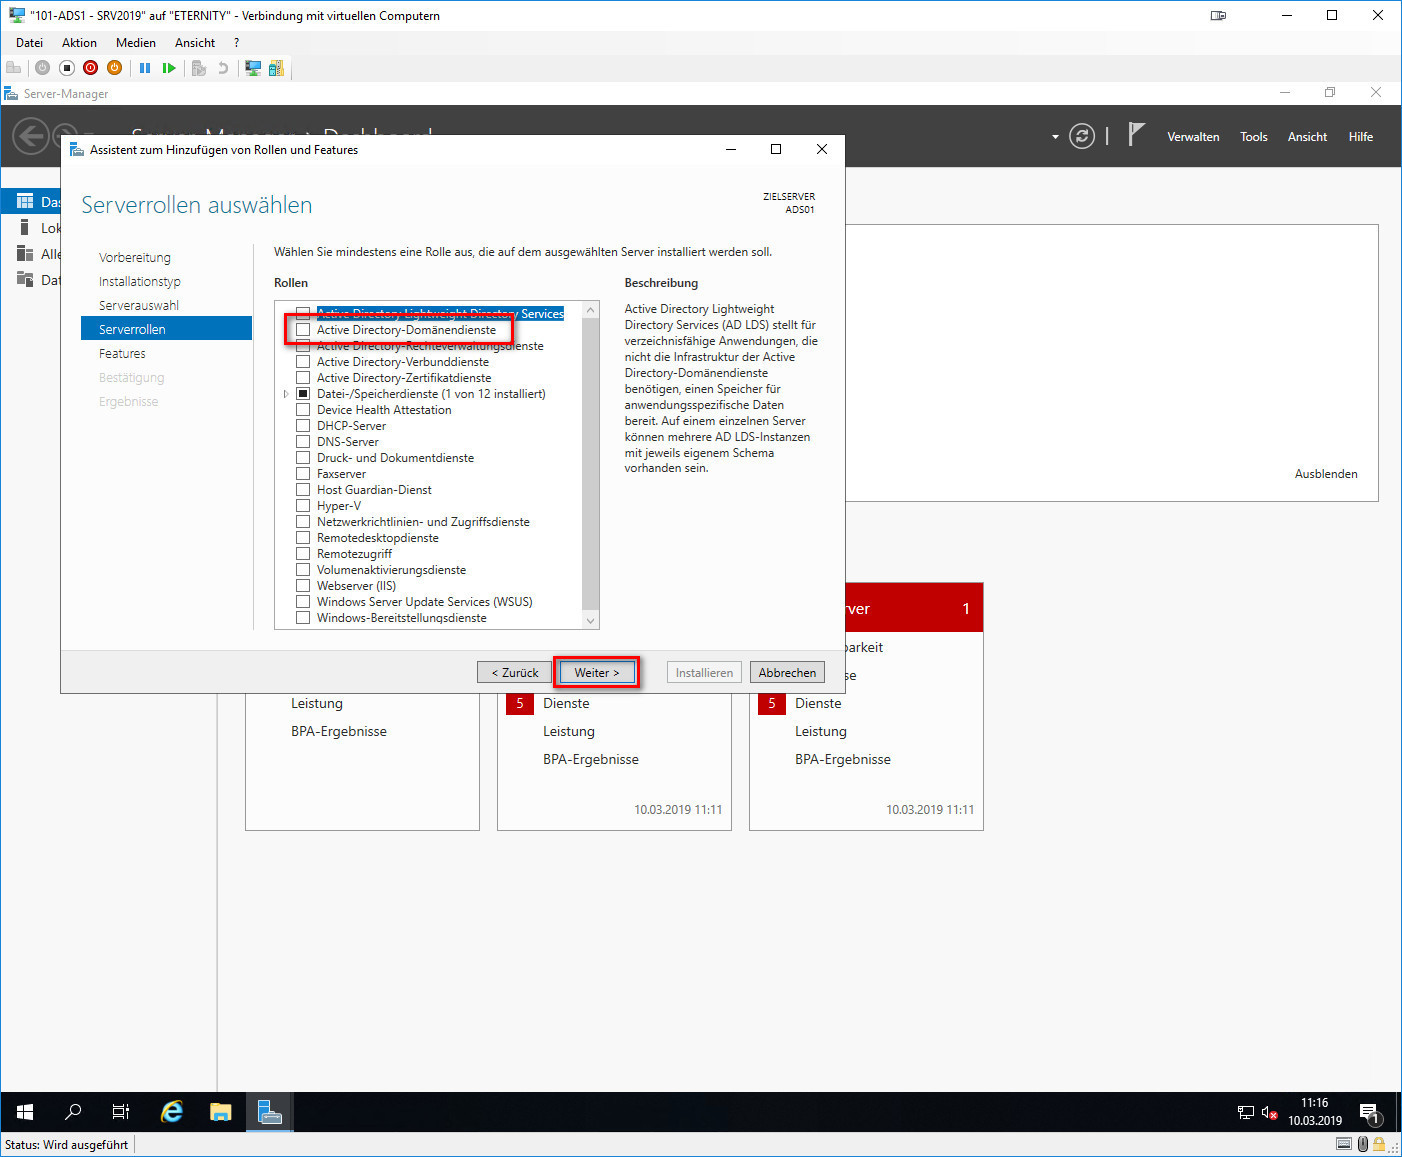 Serverrolle Active Directory-Domänendienste